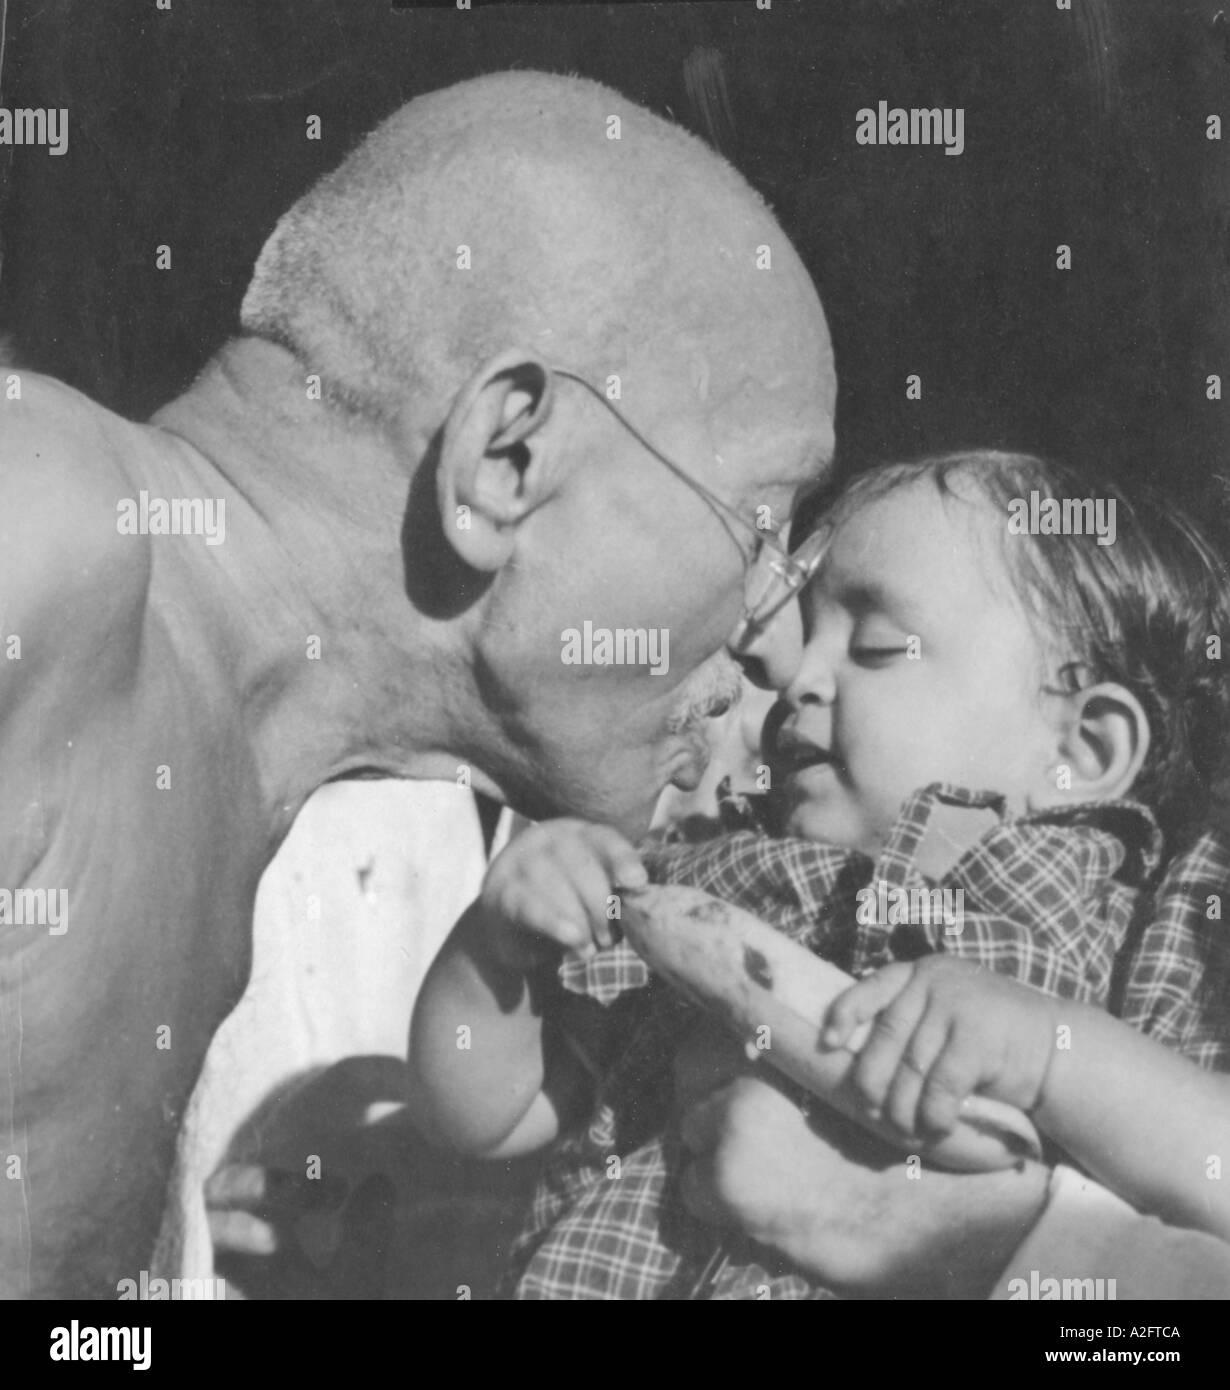 Il Mahatma Gandhi mostrando affetto e dando banana a Nandini nipote di Gandhi segretario Pyarelal Nayer Sewagram ashram in India 1944 - mkg 33185 Immagini Stock